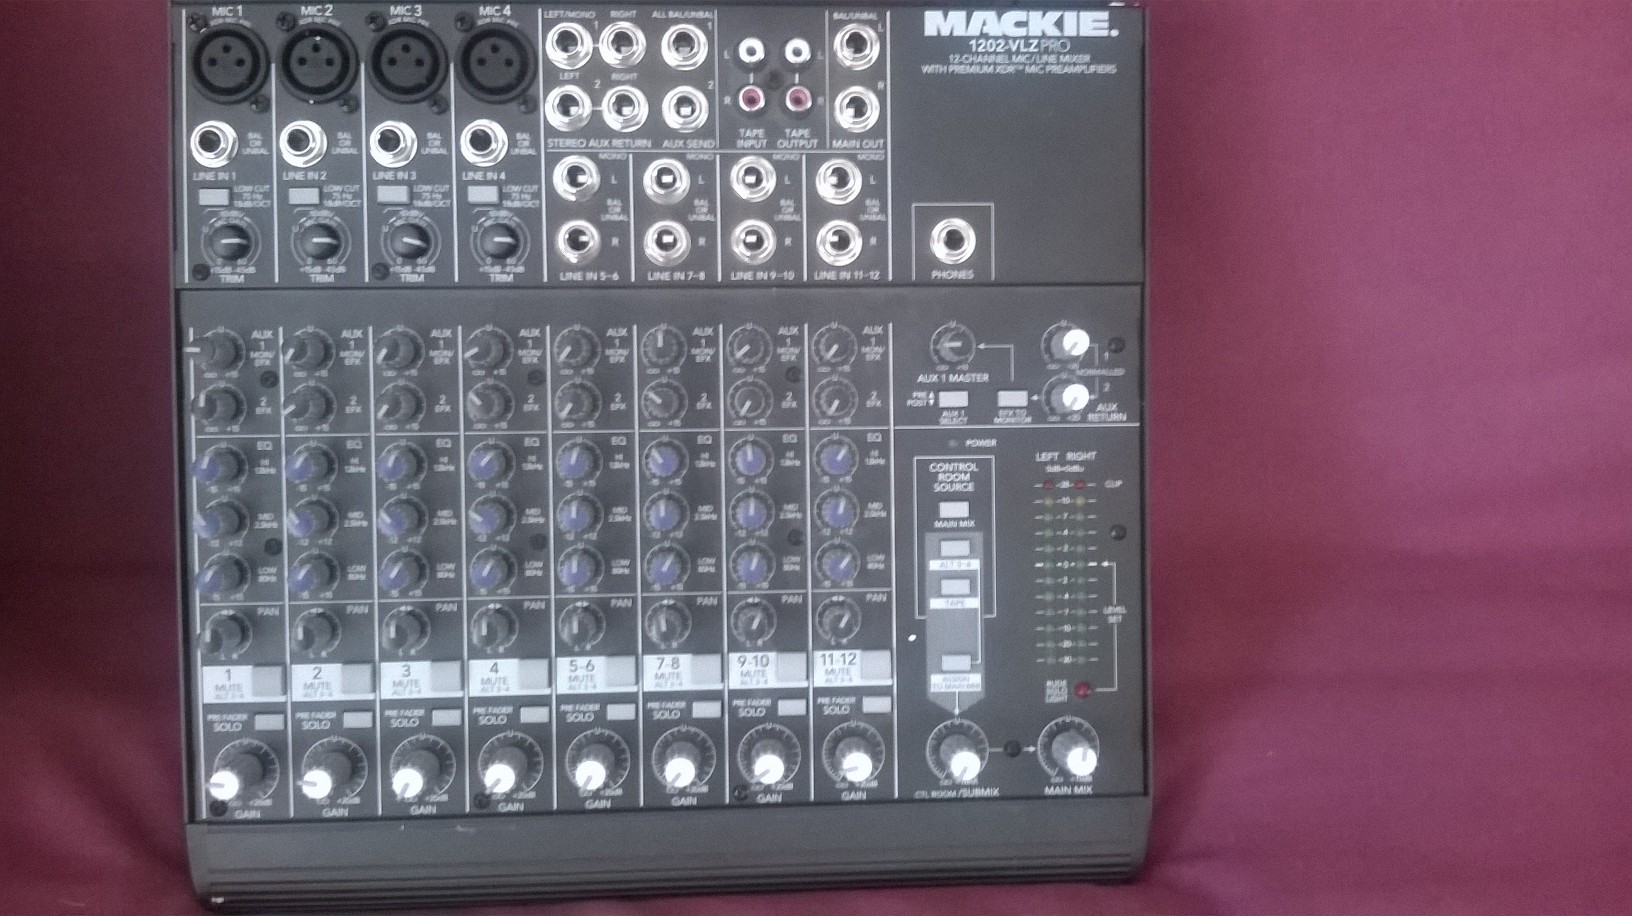 https://medias.audiofanzine.com/images/normal/mackie-1202-vlz-pro-2007582.jpg